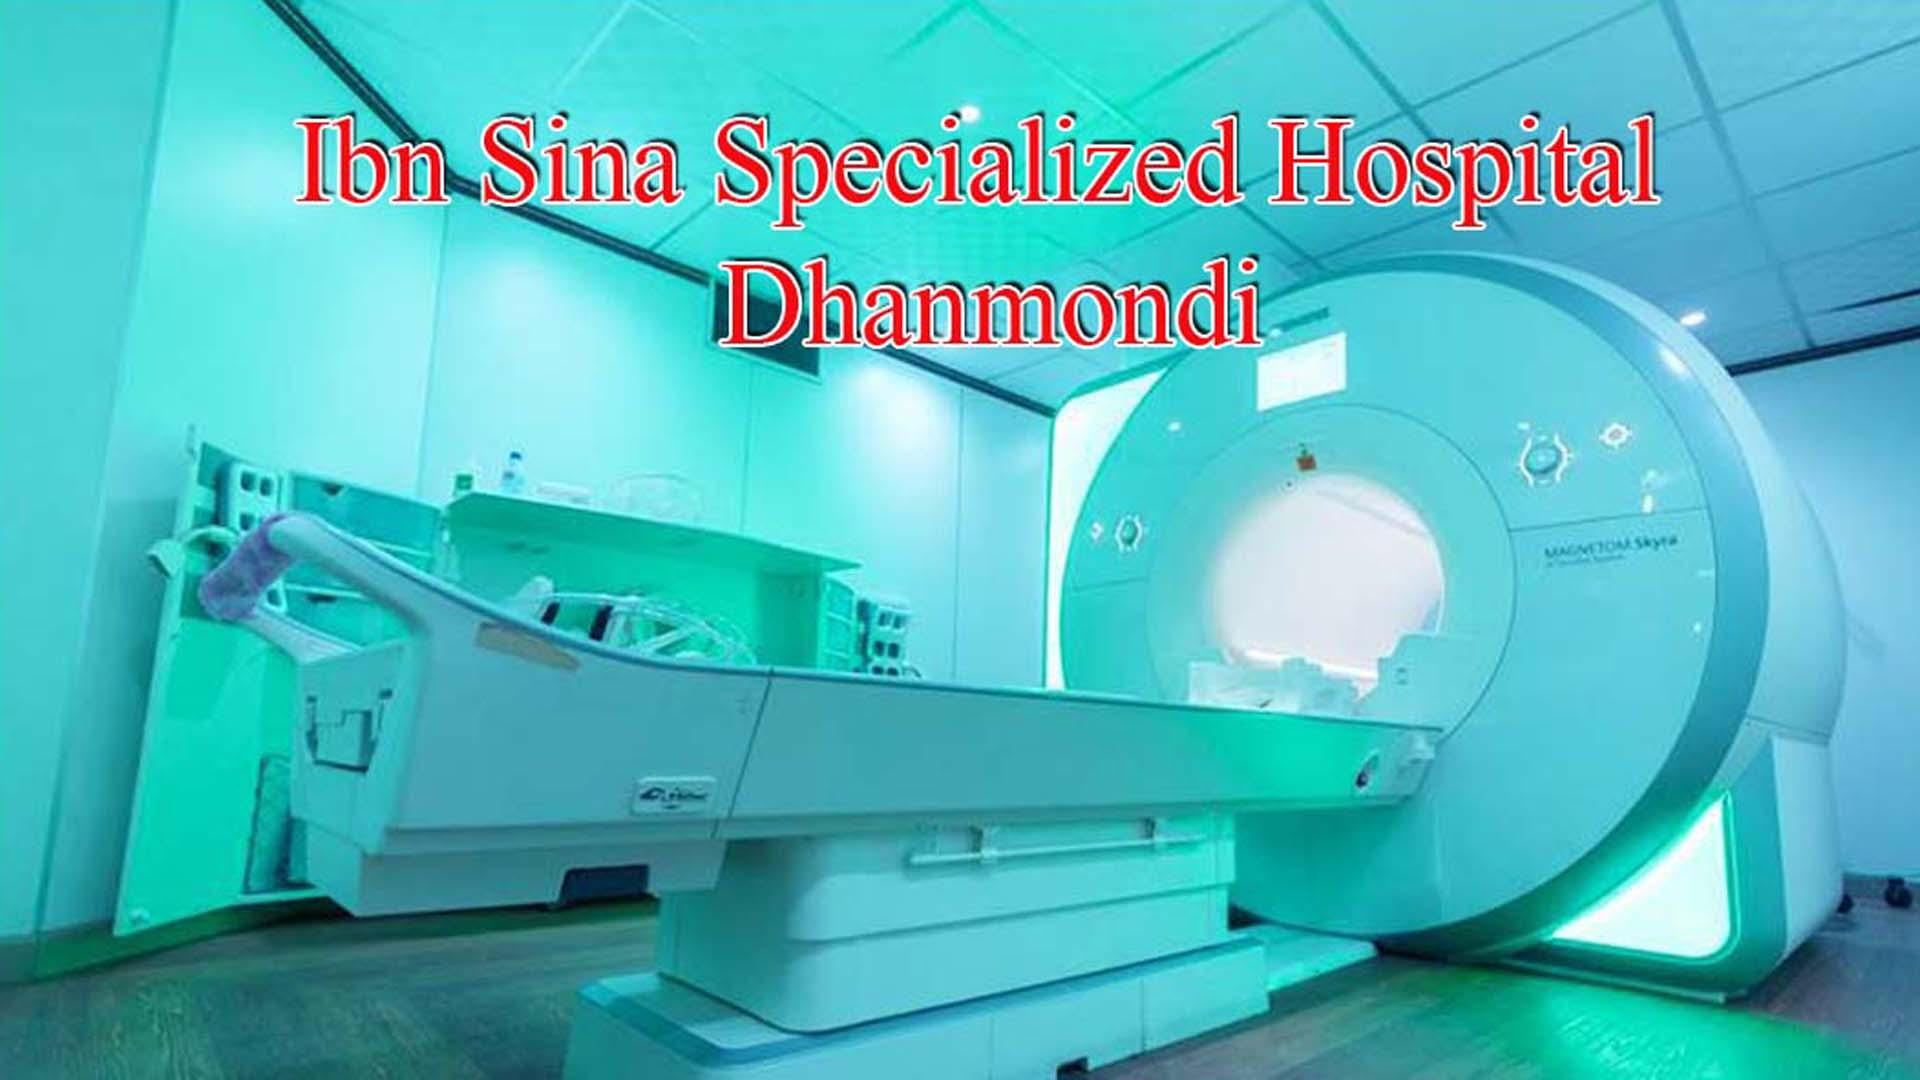 Ibn Sina Specialized Hospital Dhanmondi